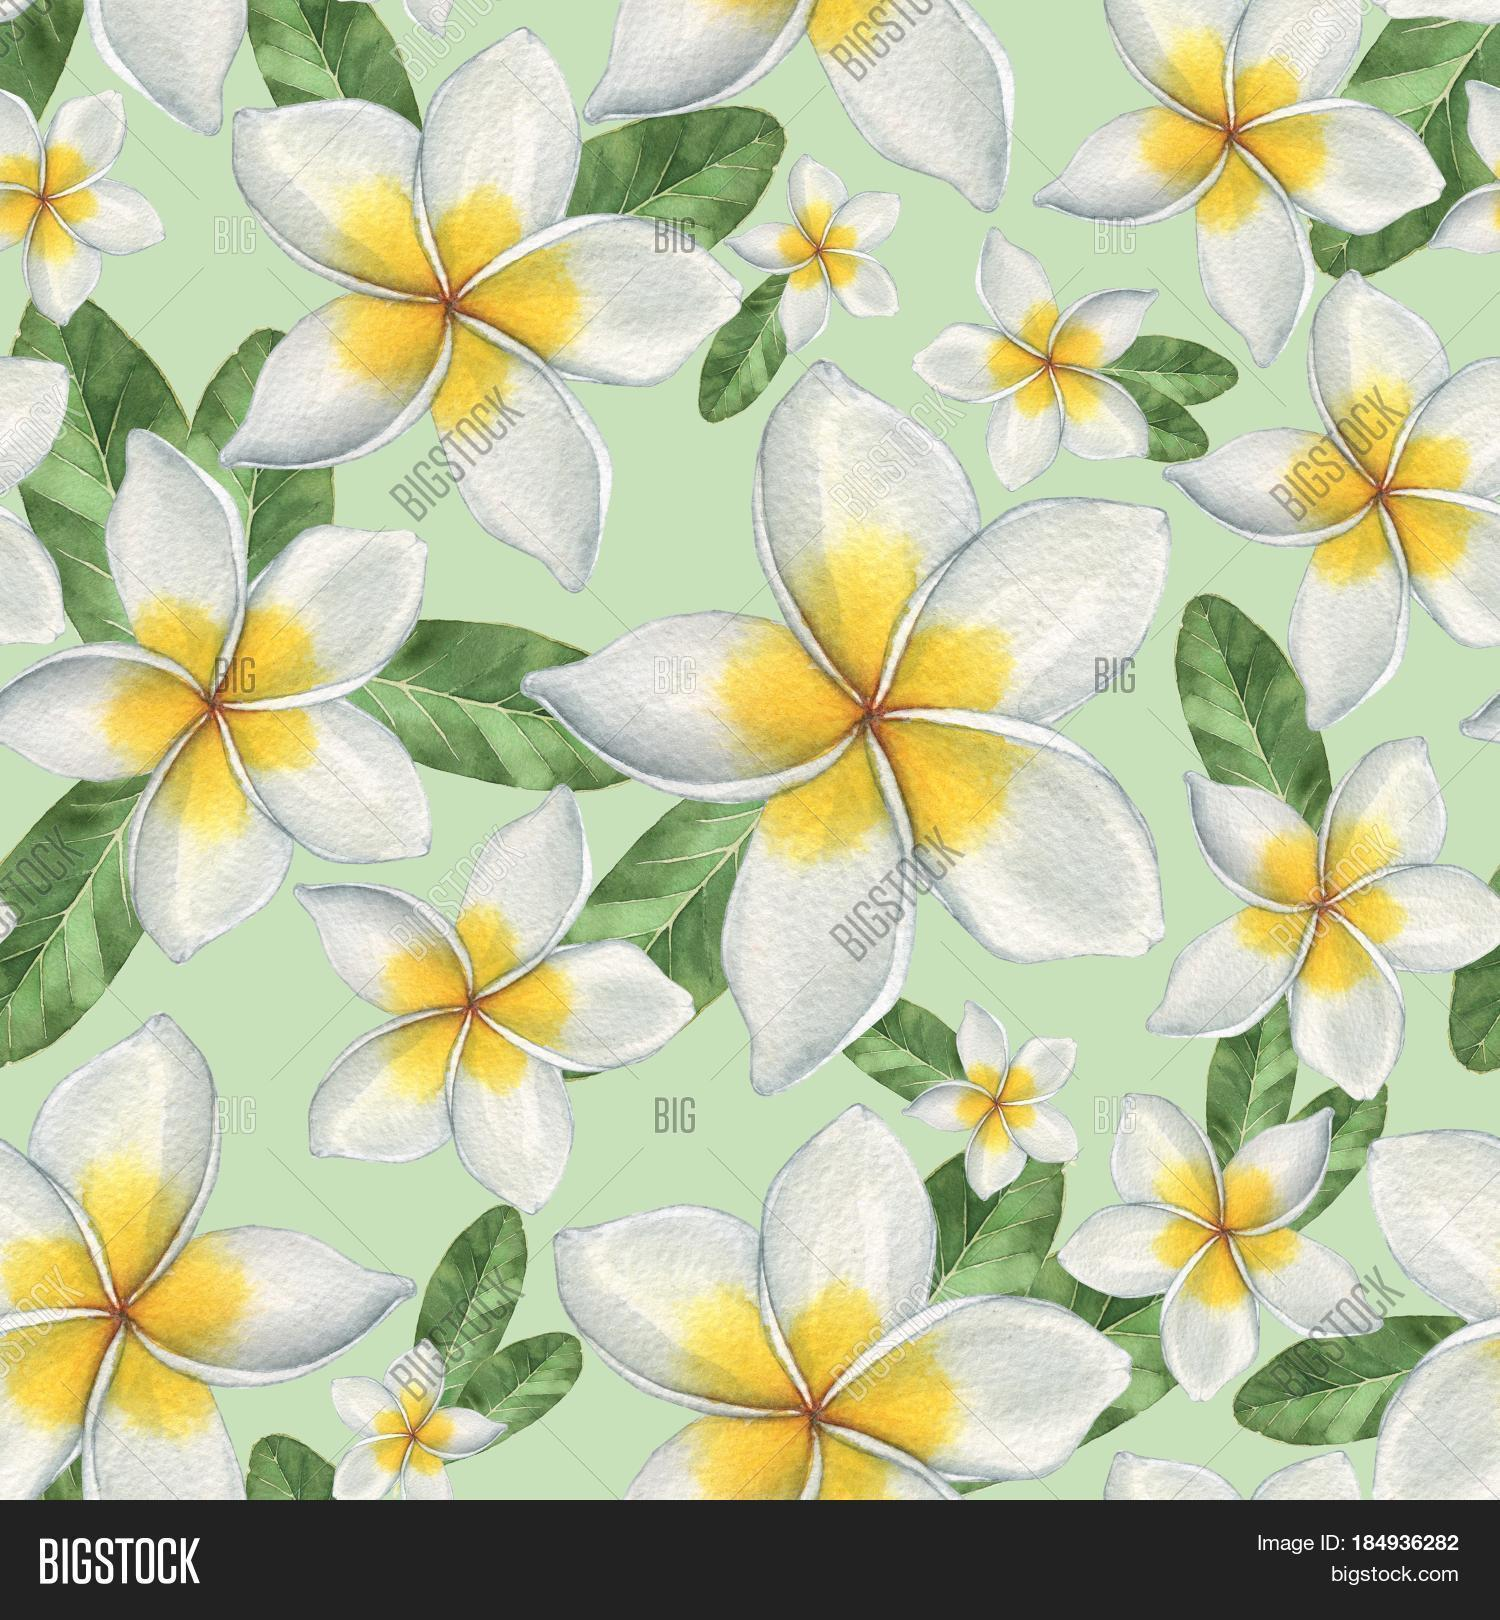 Hawaiian Flowers Image Photo Free Trial Bigstock